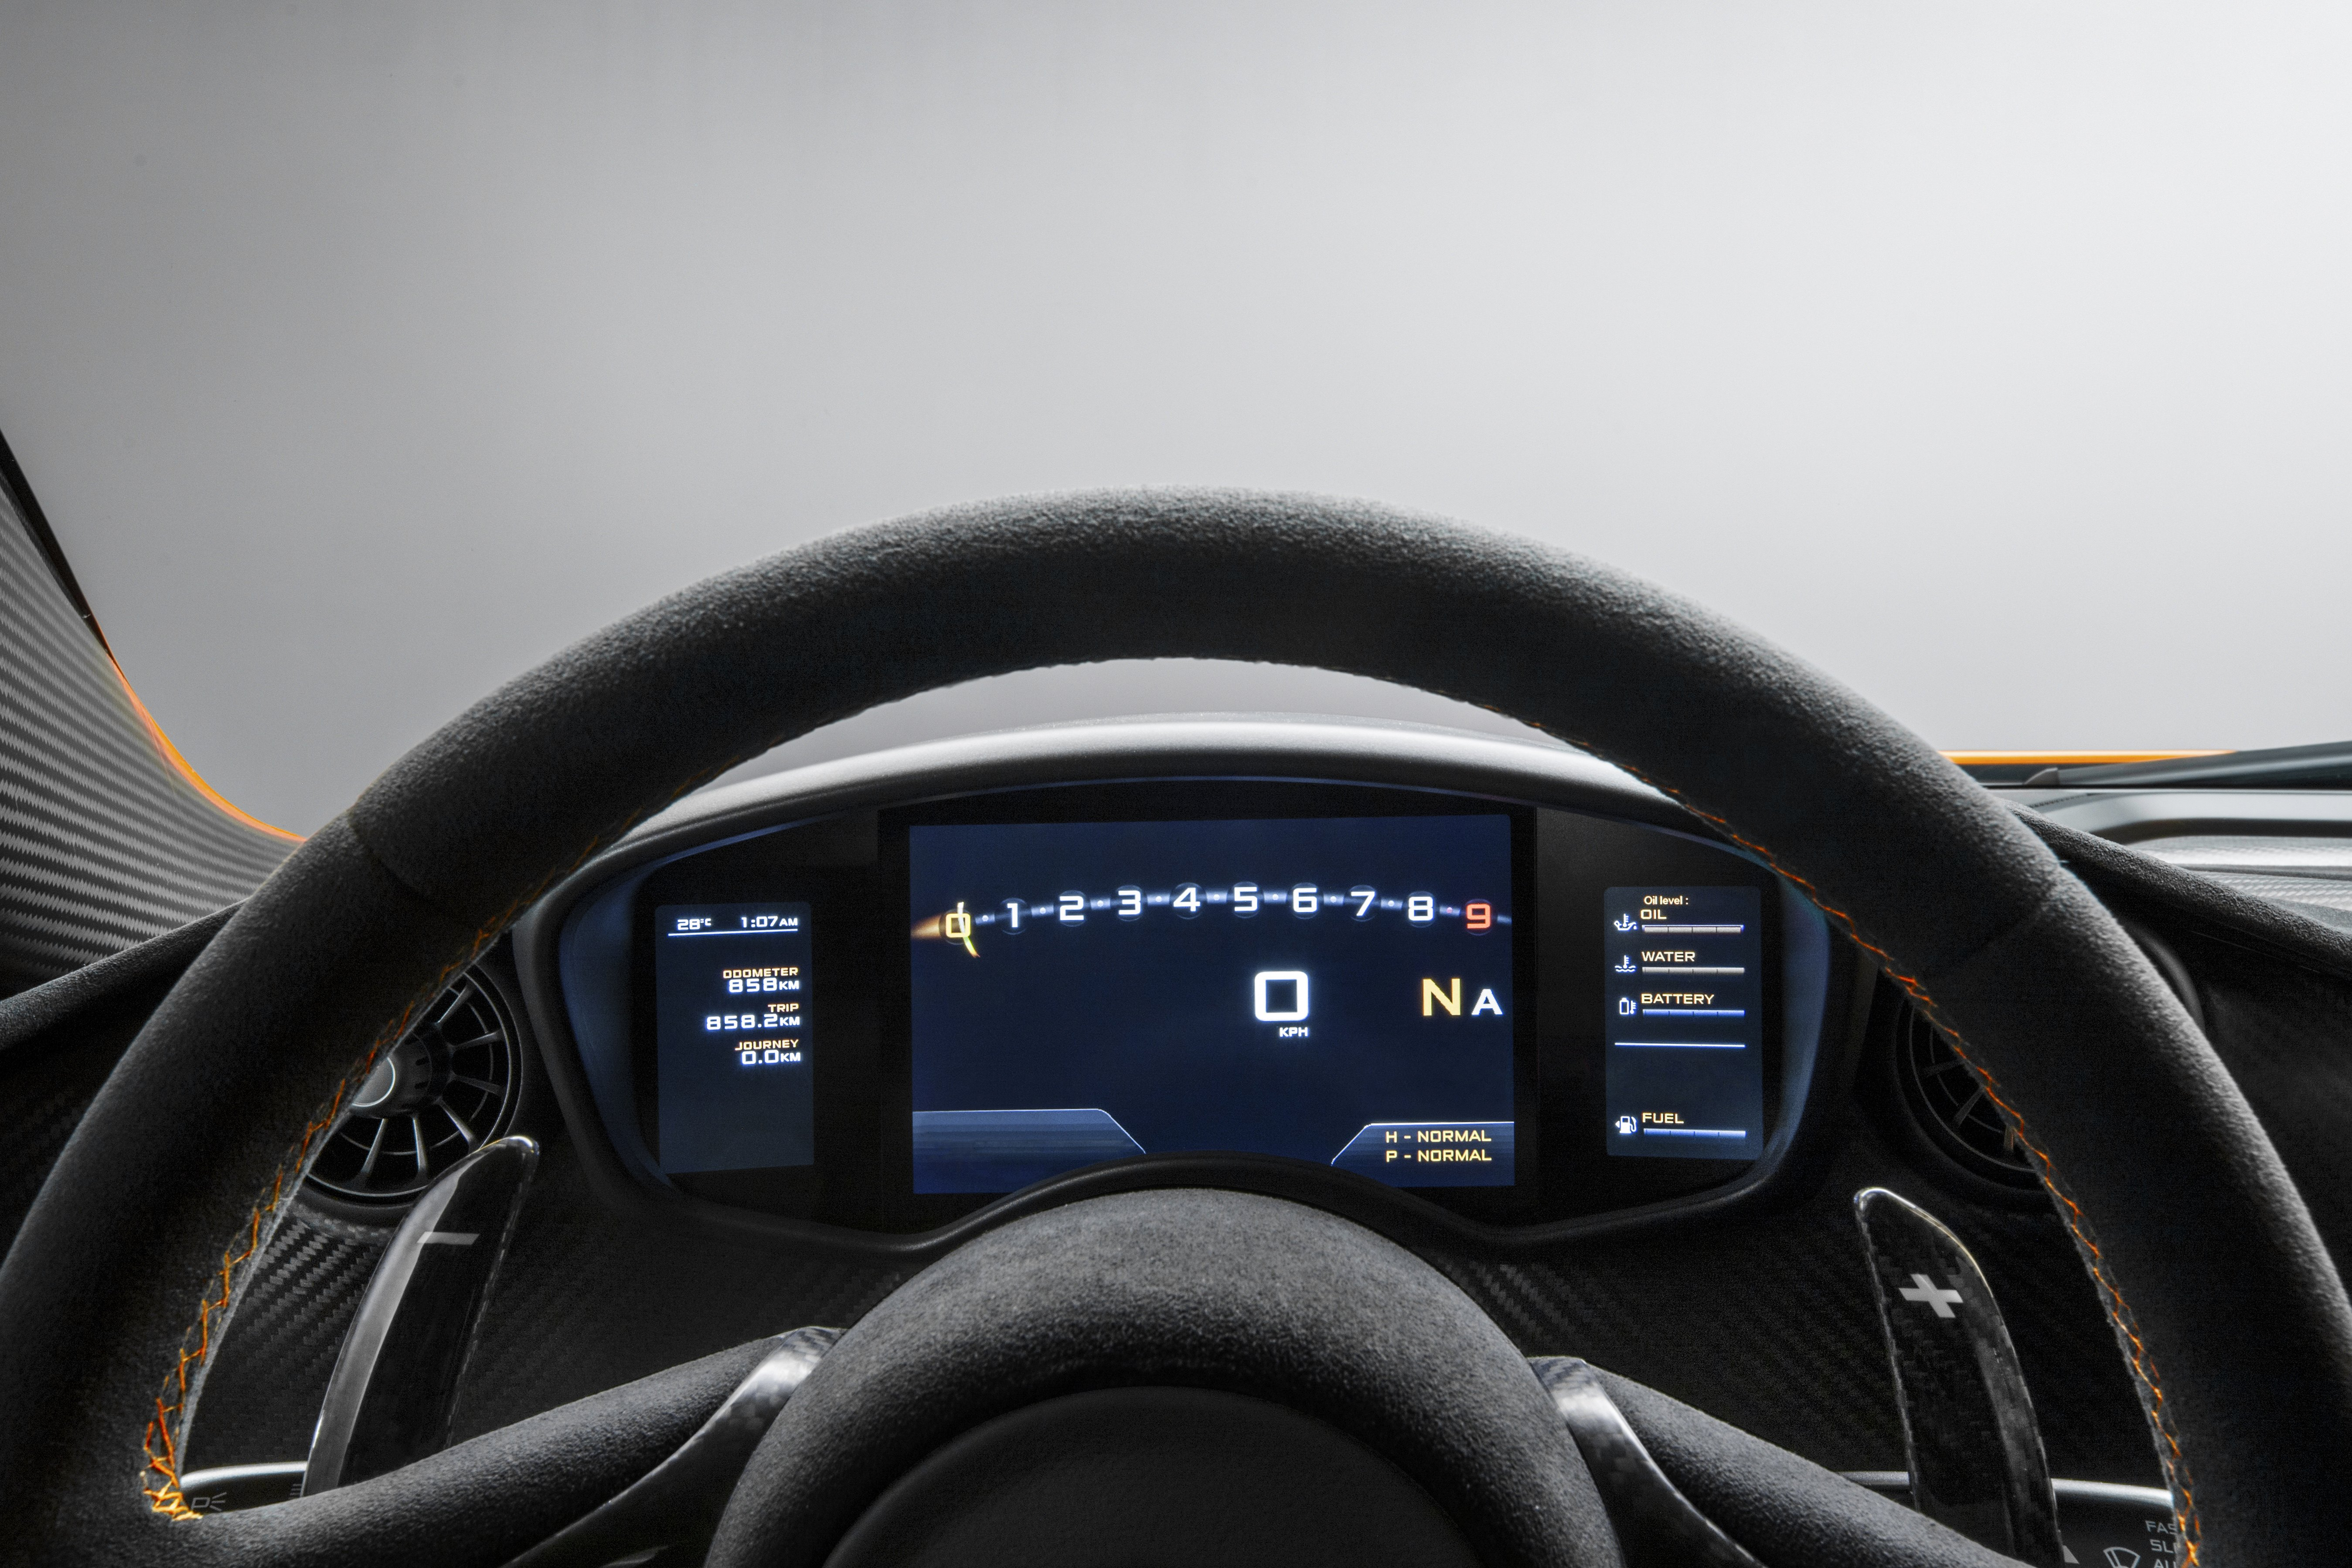 McLaren P1 2013 Interior Carbon steering wheel and dashboard detail High Resolution